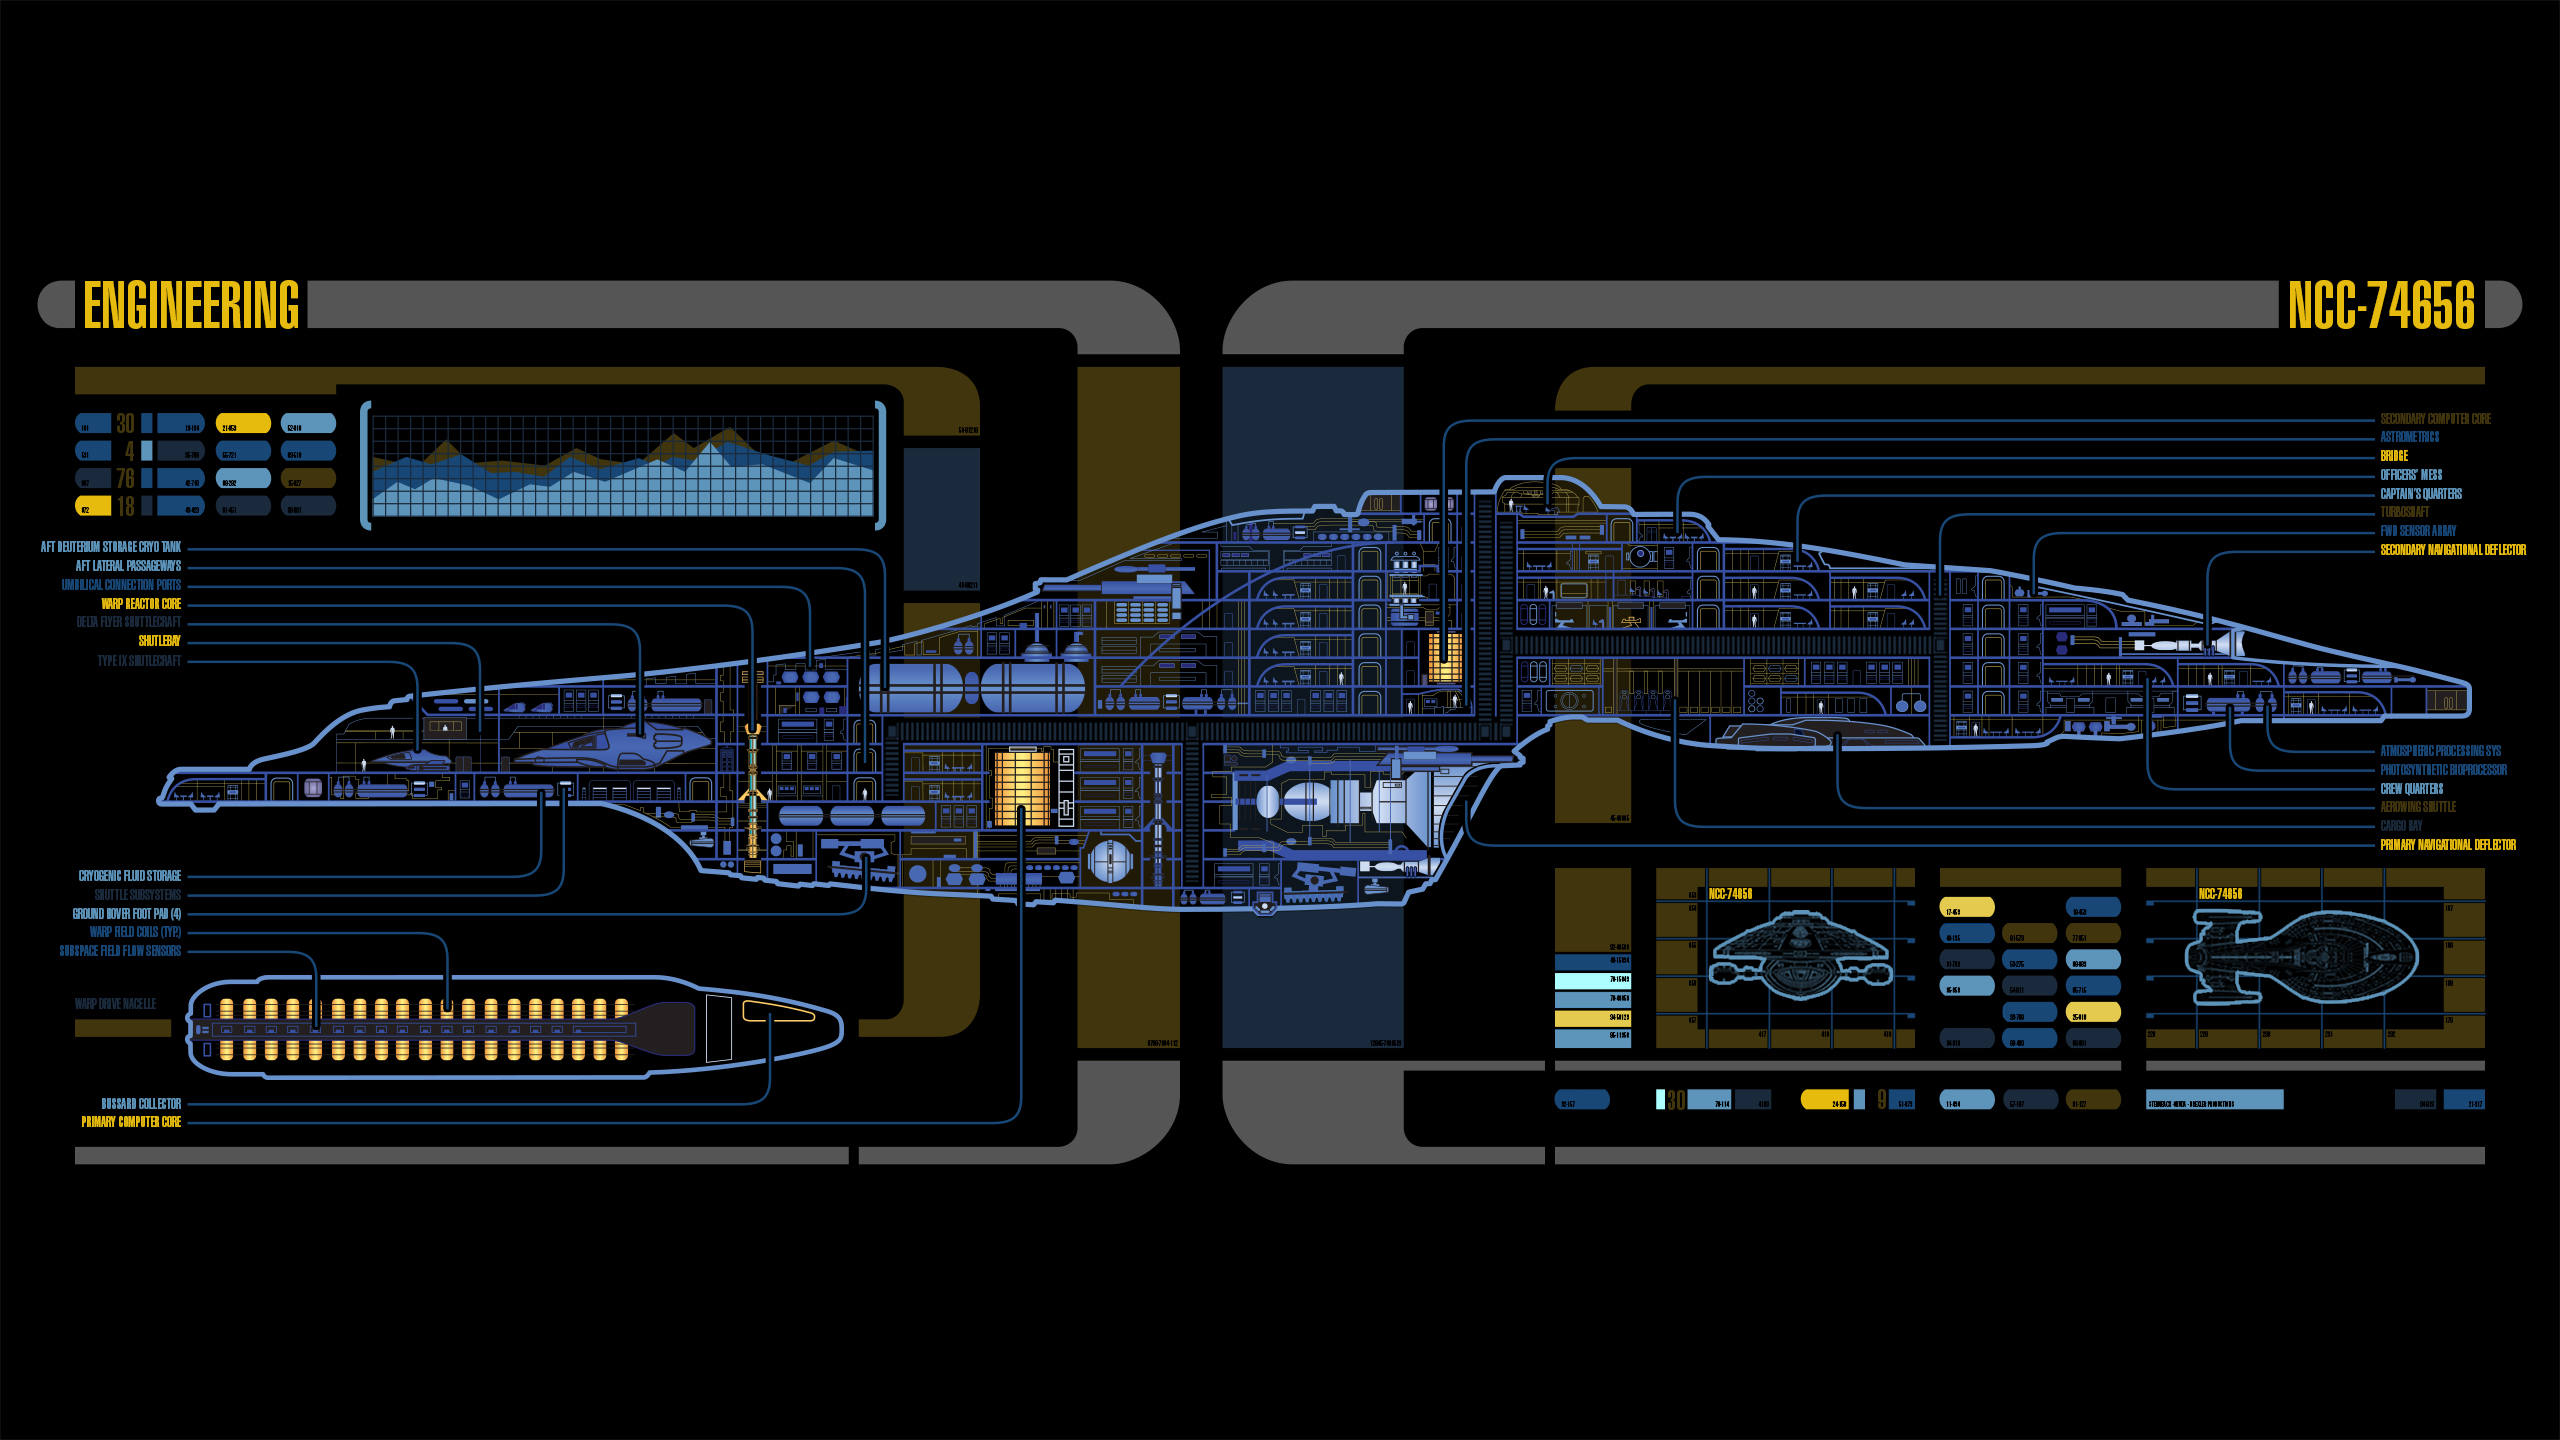 General 2560x1440 Star Trek USS Voyager LCARS